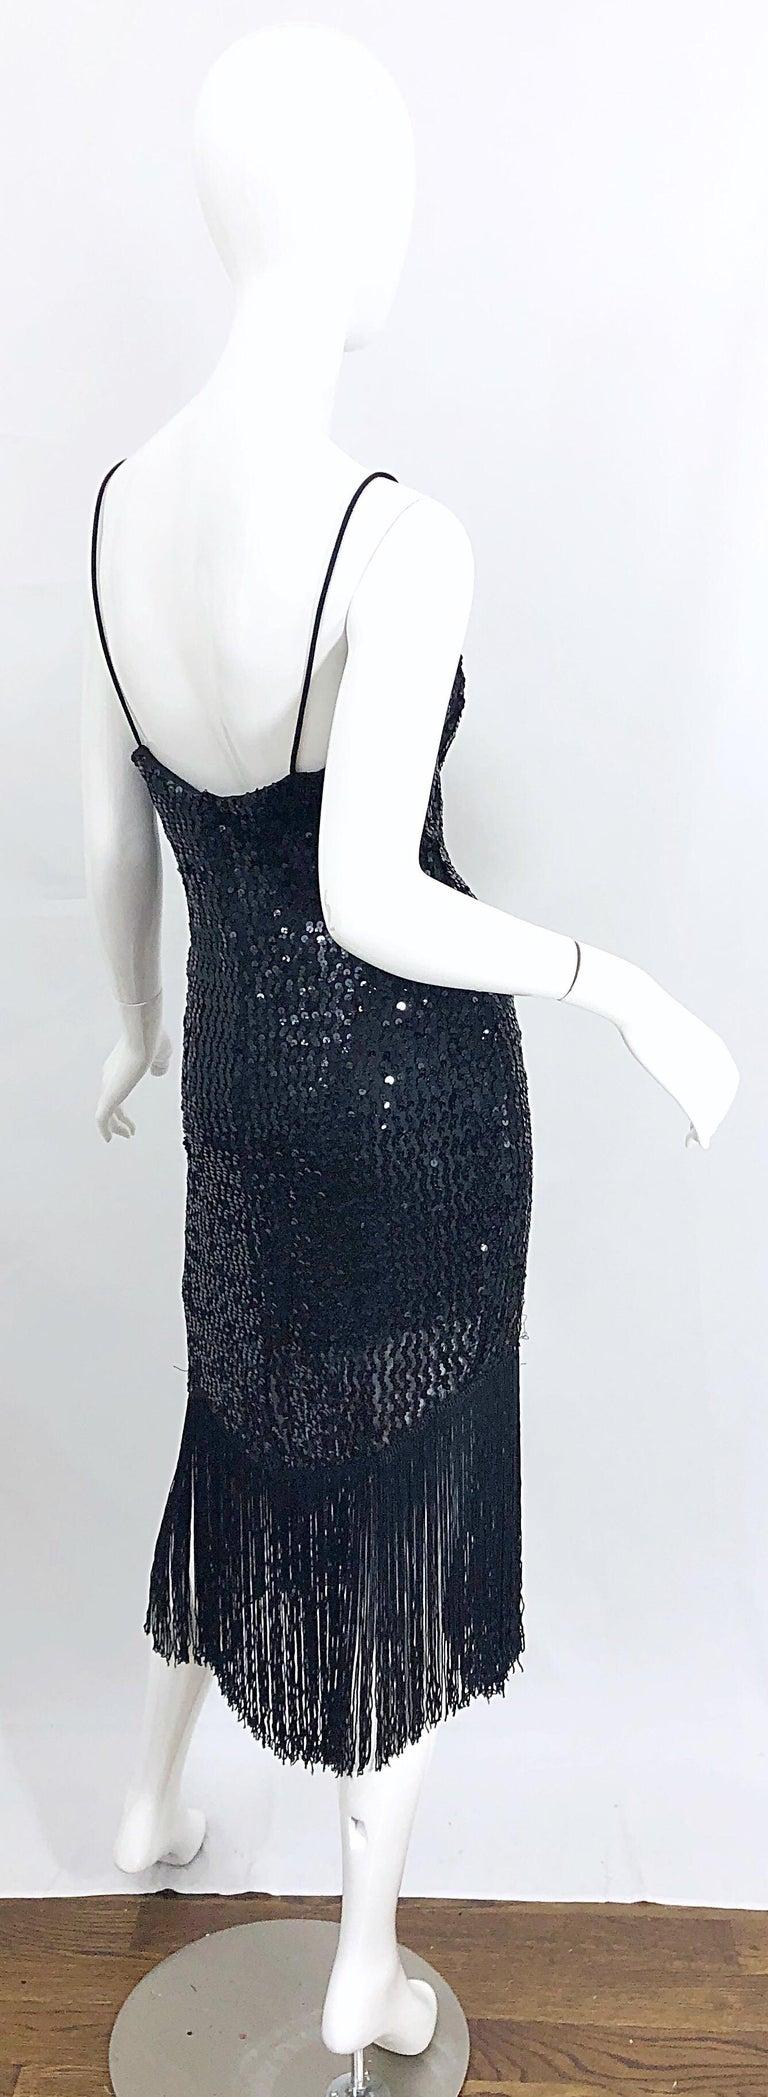 NWT 1970s Joy Stevens Size 10 / 12 Black Sequined Flapper Style Vintage Dress For Sale 9